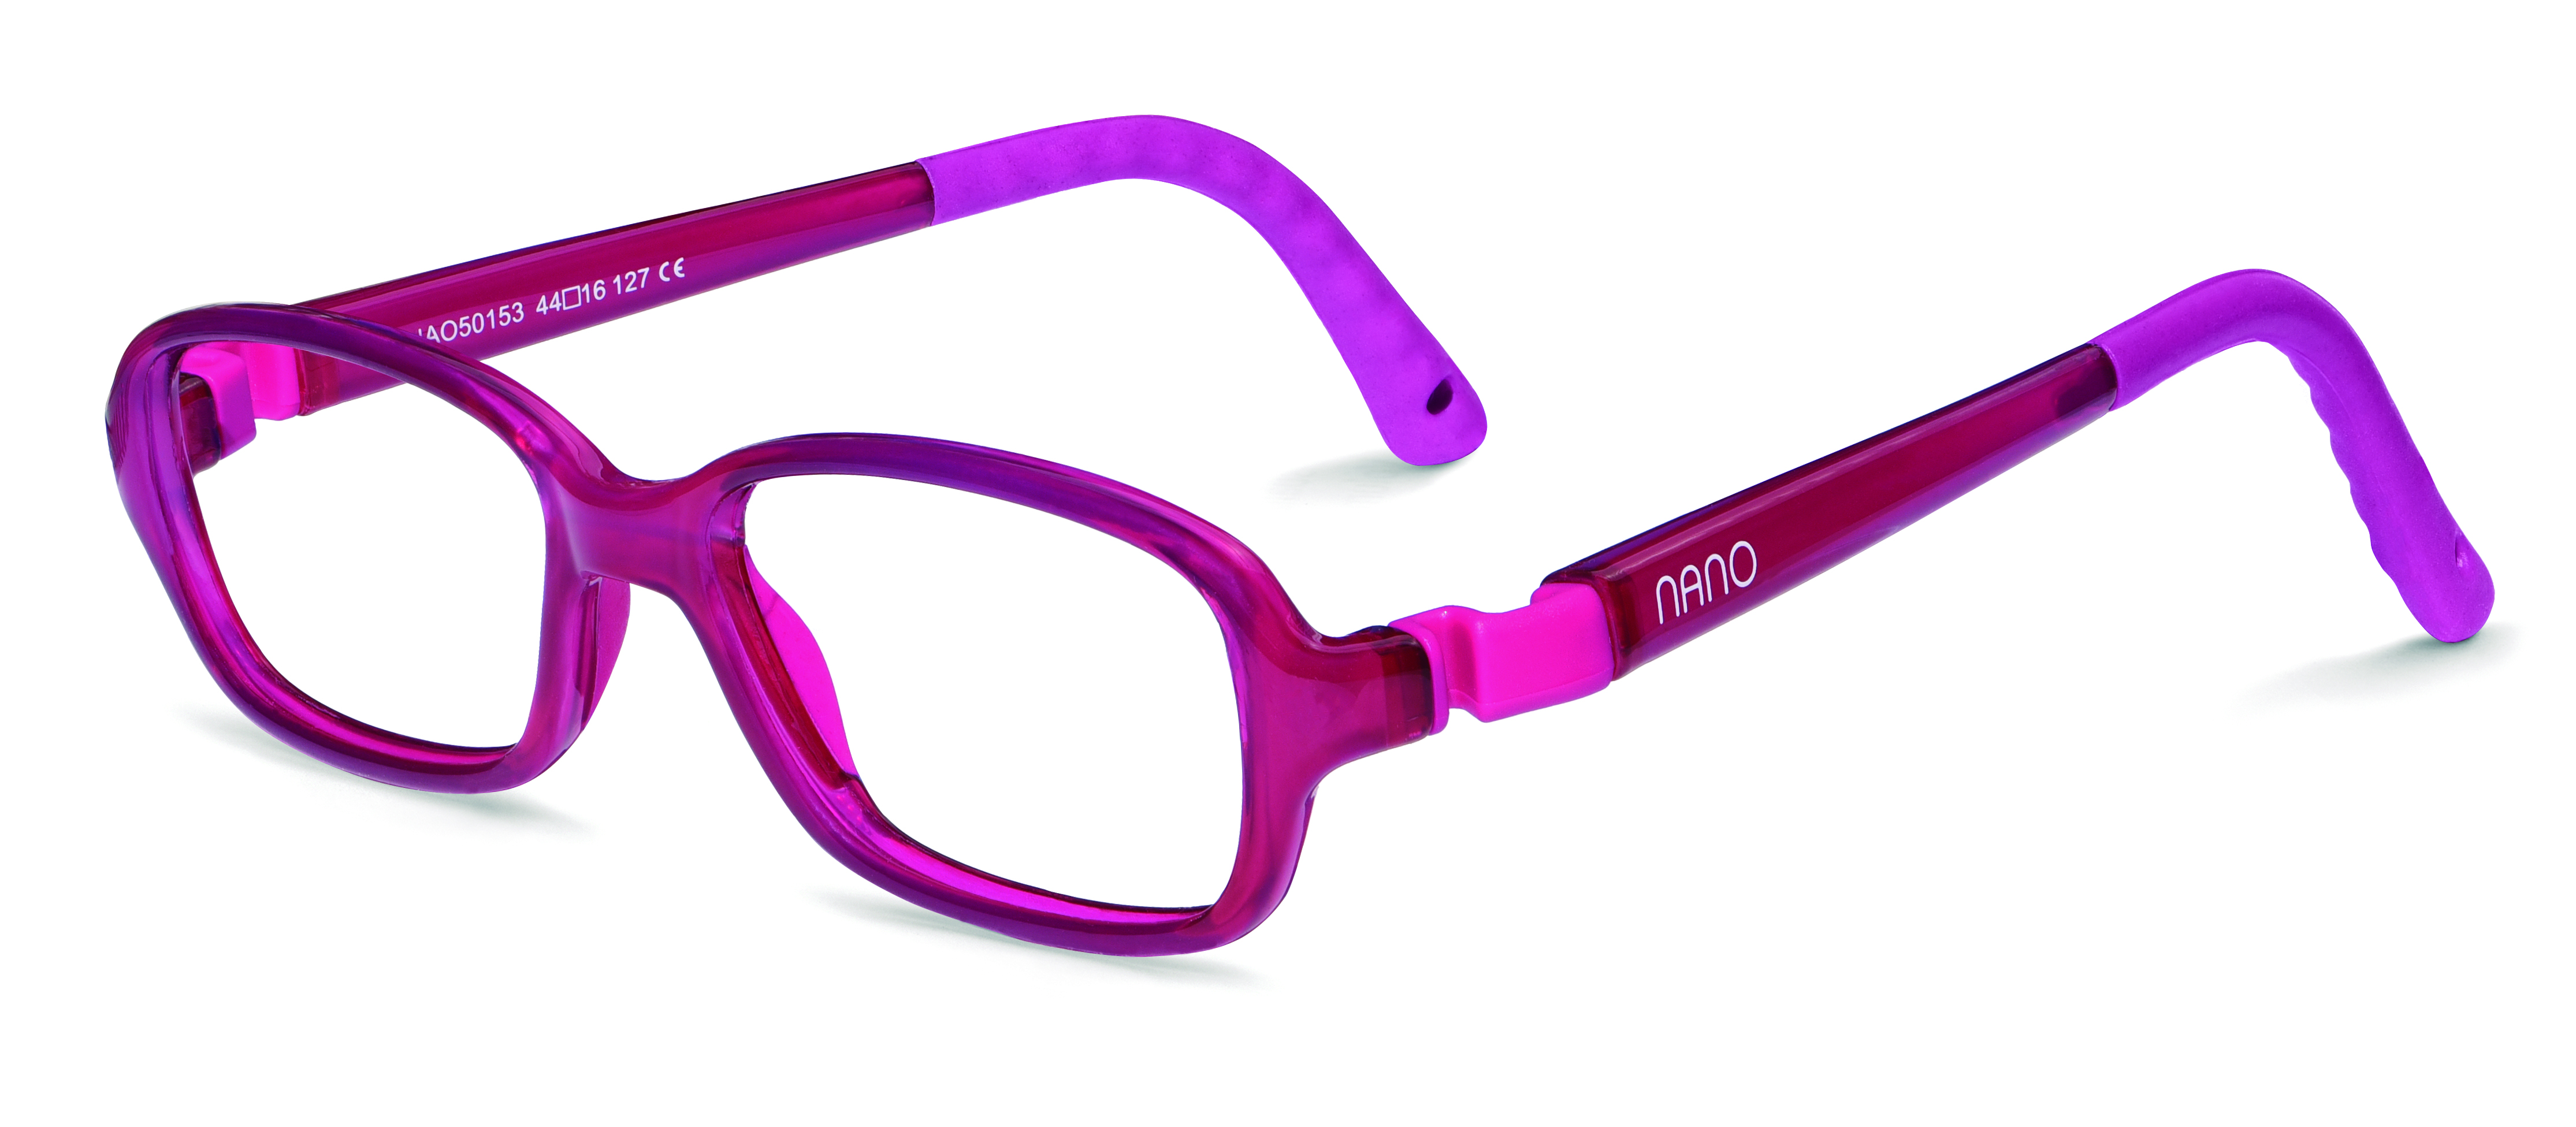 b6548c91b7 Nano NAO50153 Re-Play Kids Eyeglasses Raspberry Raspberry Eye Size 44-15  (6-8 Years) NAO50153 - Optiwow